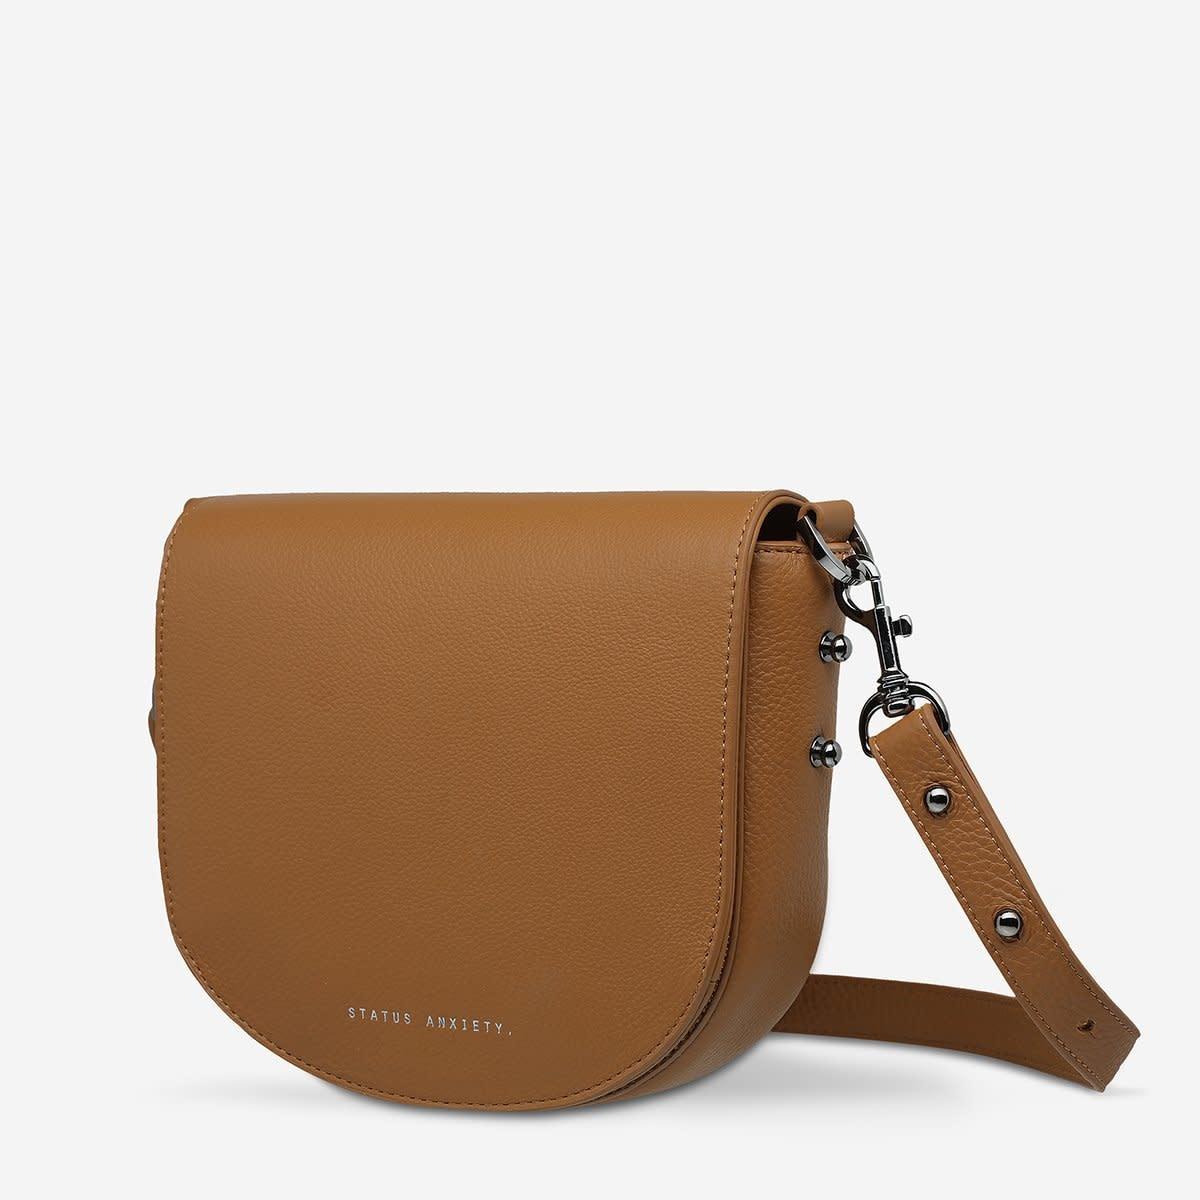 Status Anxiety Art Of Pretending bag